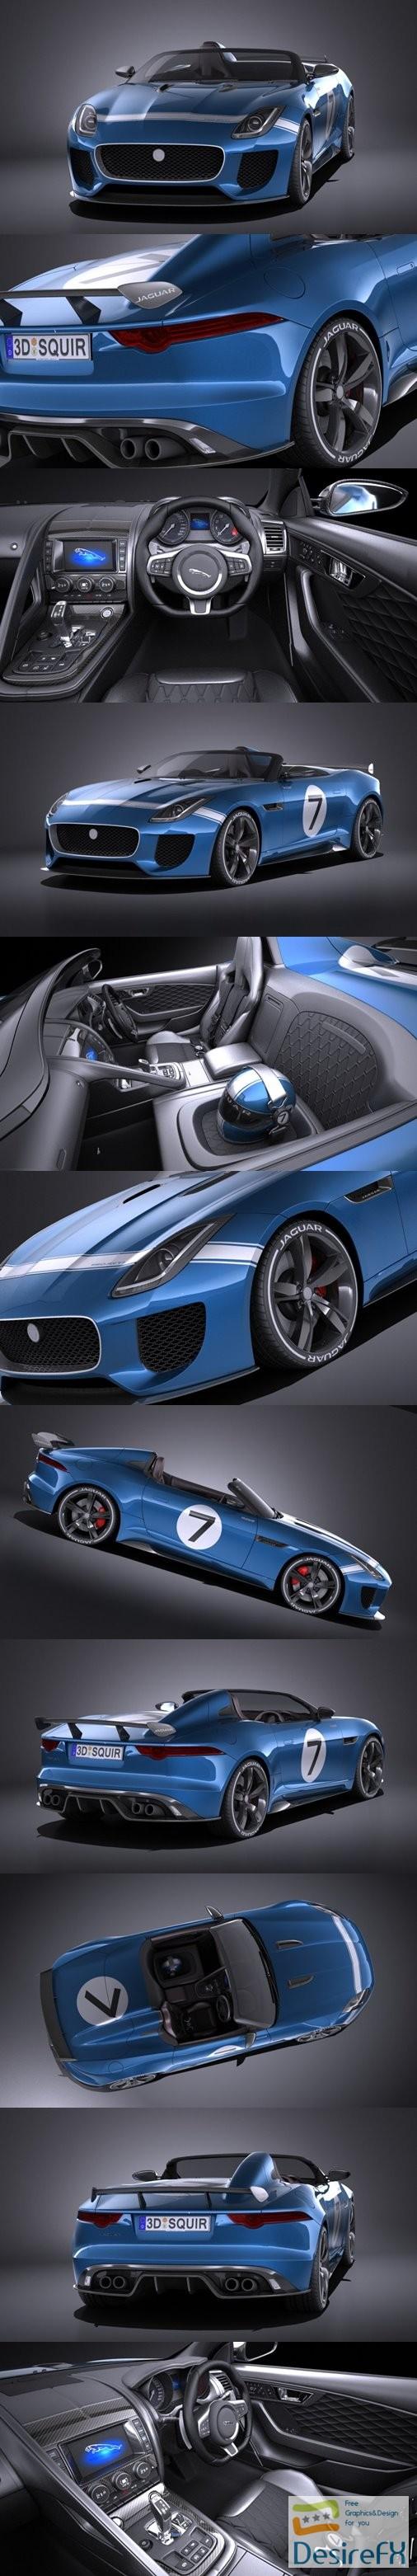 Jaguar Project 7 Concept 2016 VRAY 3D Model